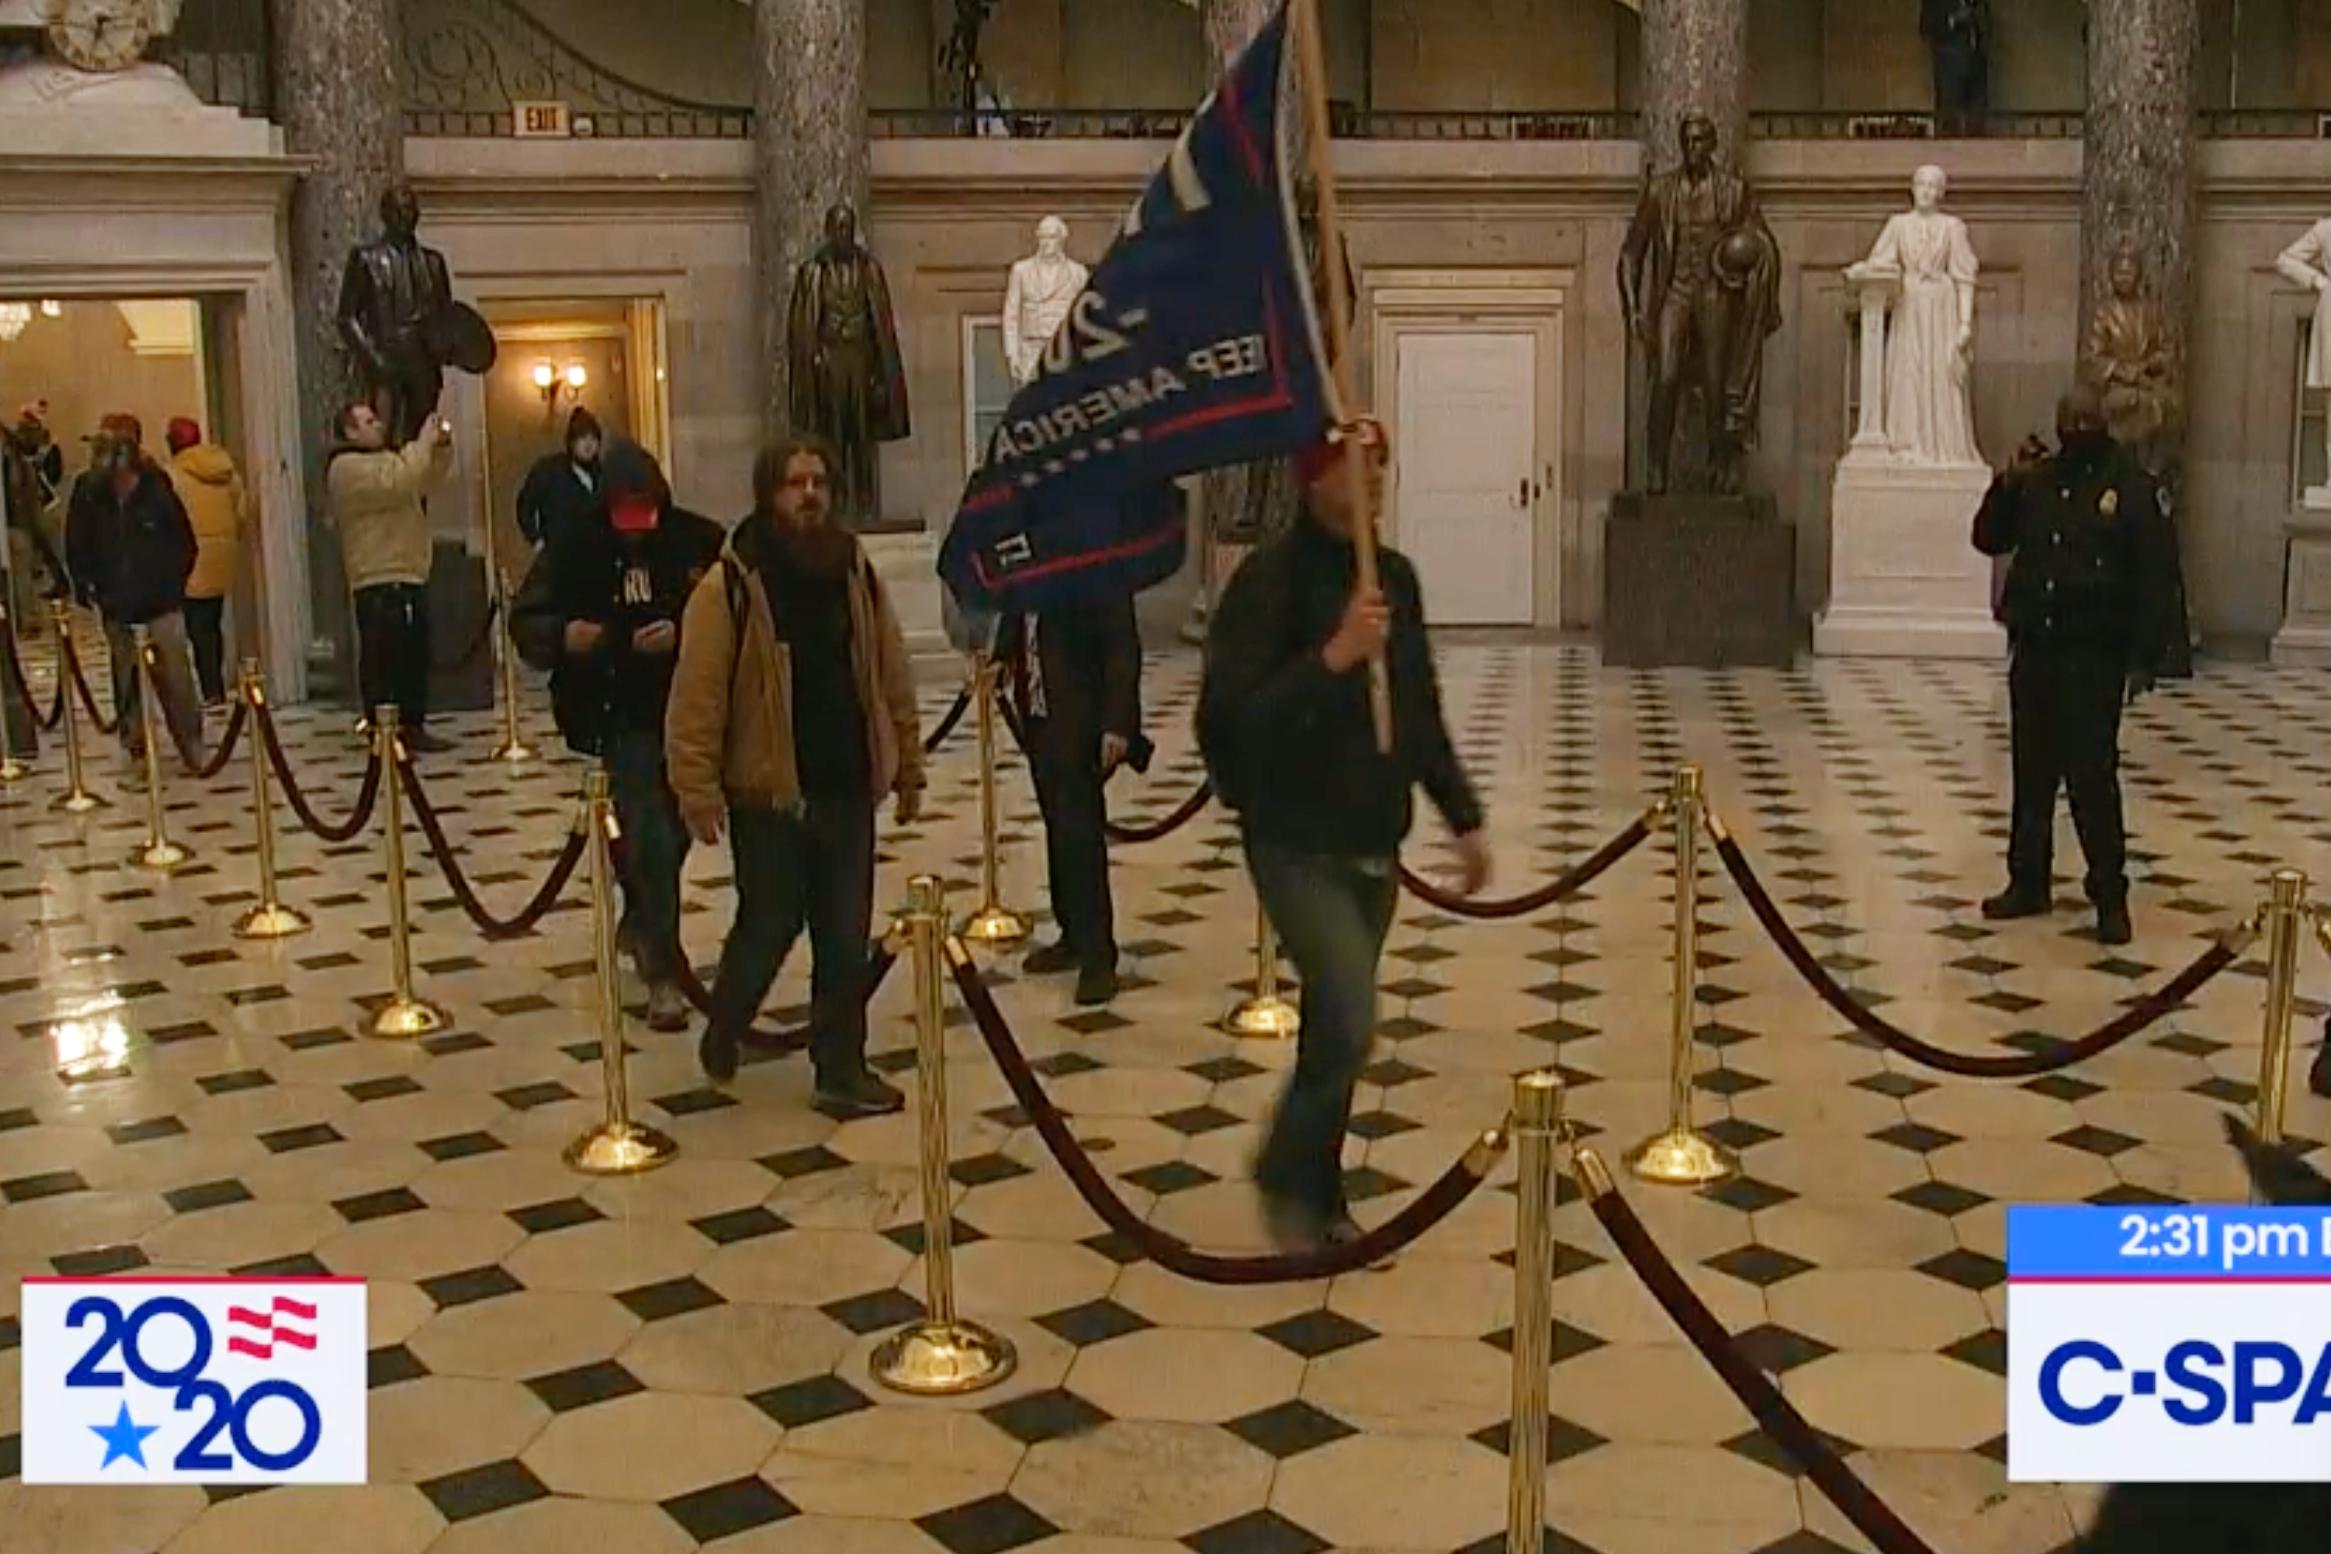 Trump supporters storm the U.S. Capitol, Jan. 6, 2020.